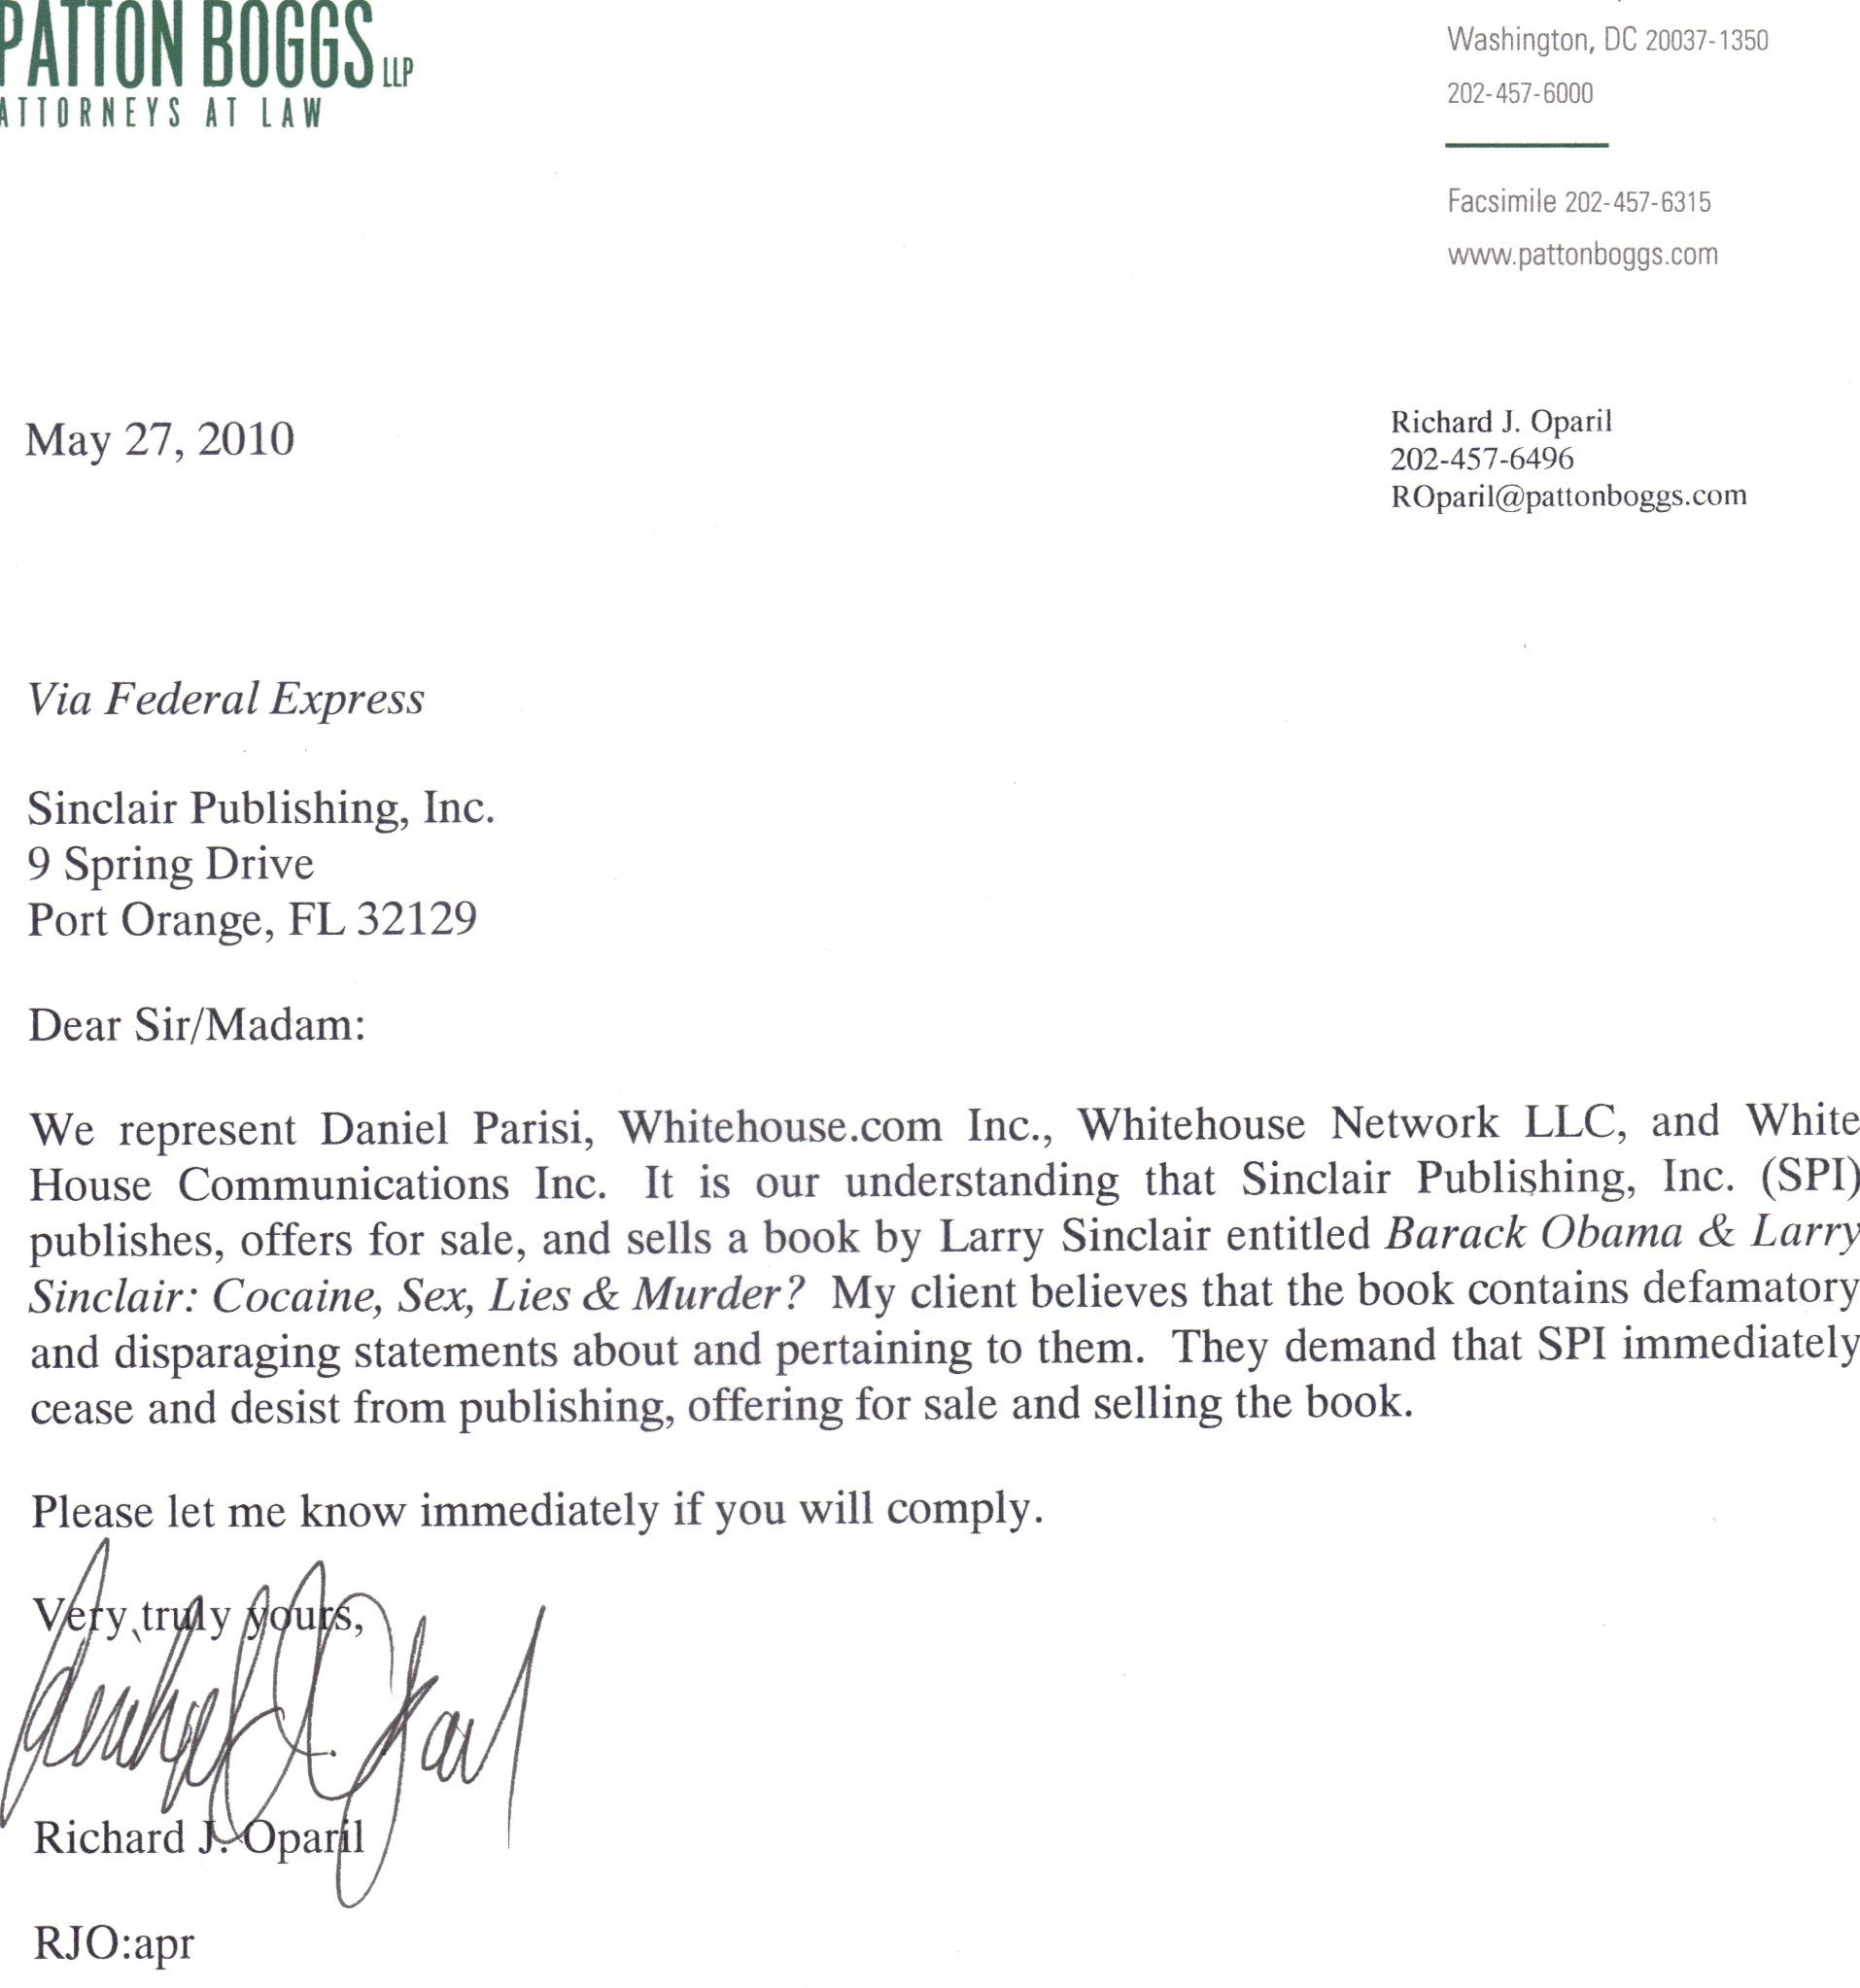 Sinclair Gets Cease & Desist Letter Over Book